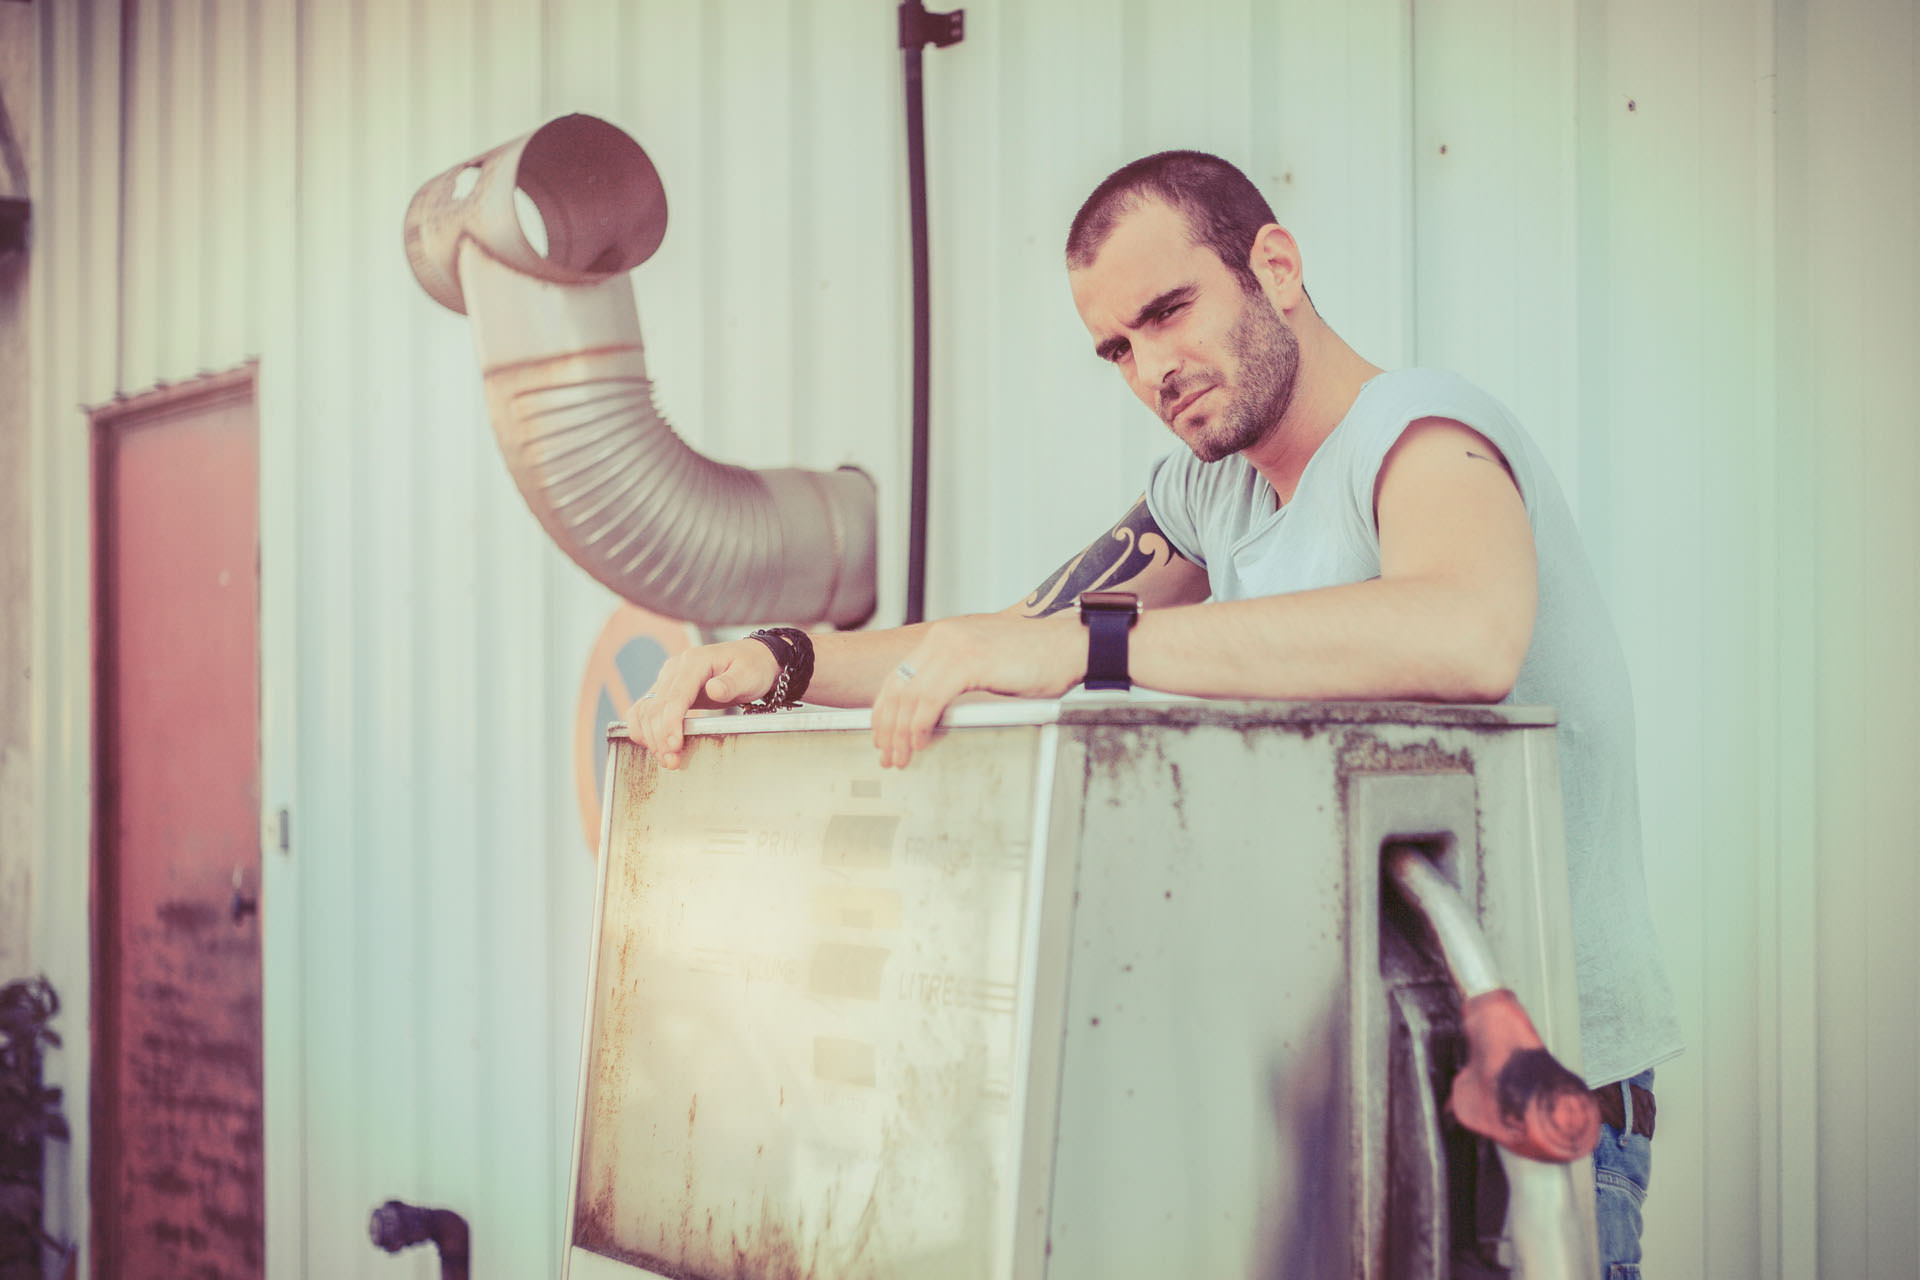 2012-06-22 - Jonathan Bogdanovic - Cerny - 7638 - 1920px